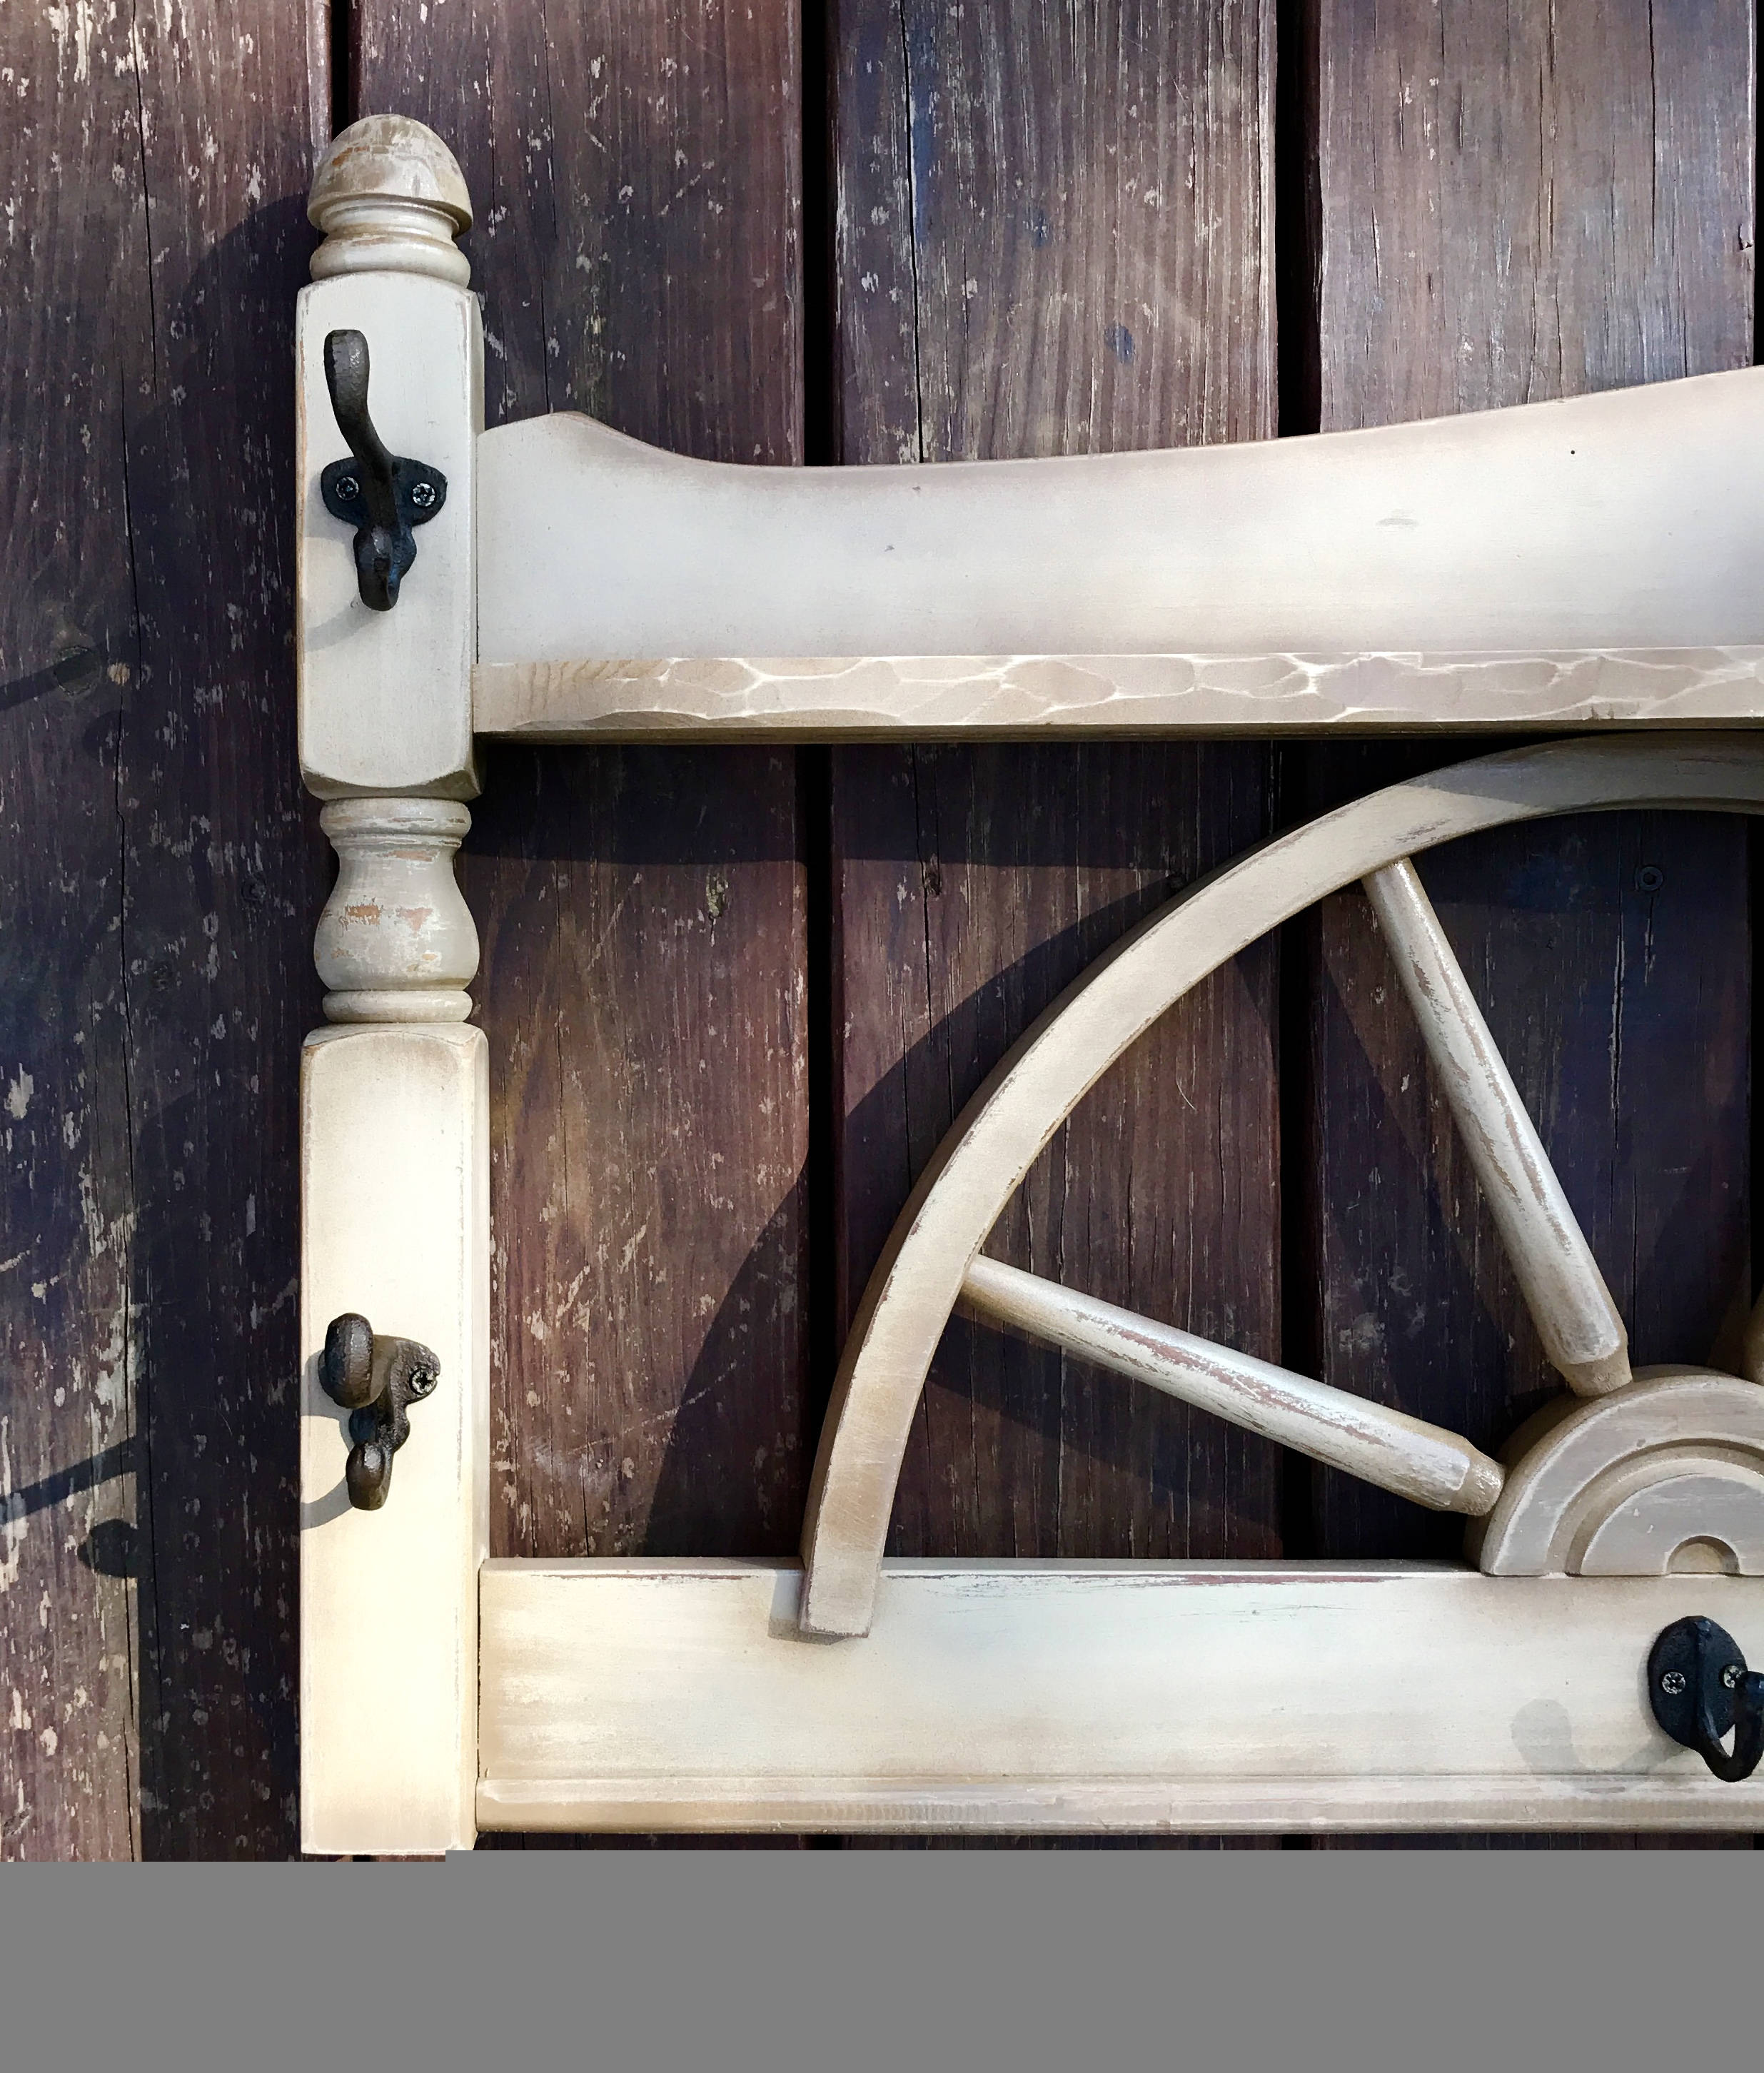 Vintage Style Entrance Hall: Vintage Wagon Wheel, Western Decor, Shelf, Hat, Coat Rack